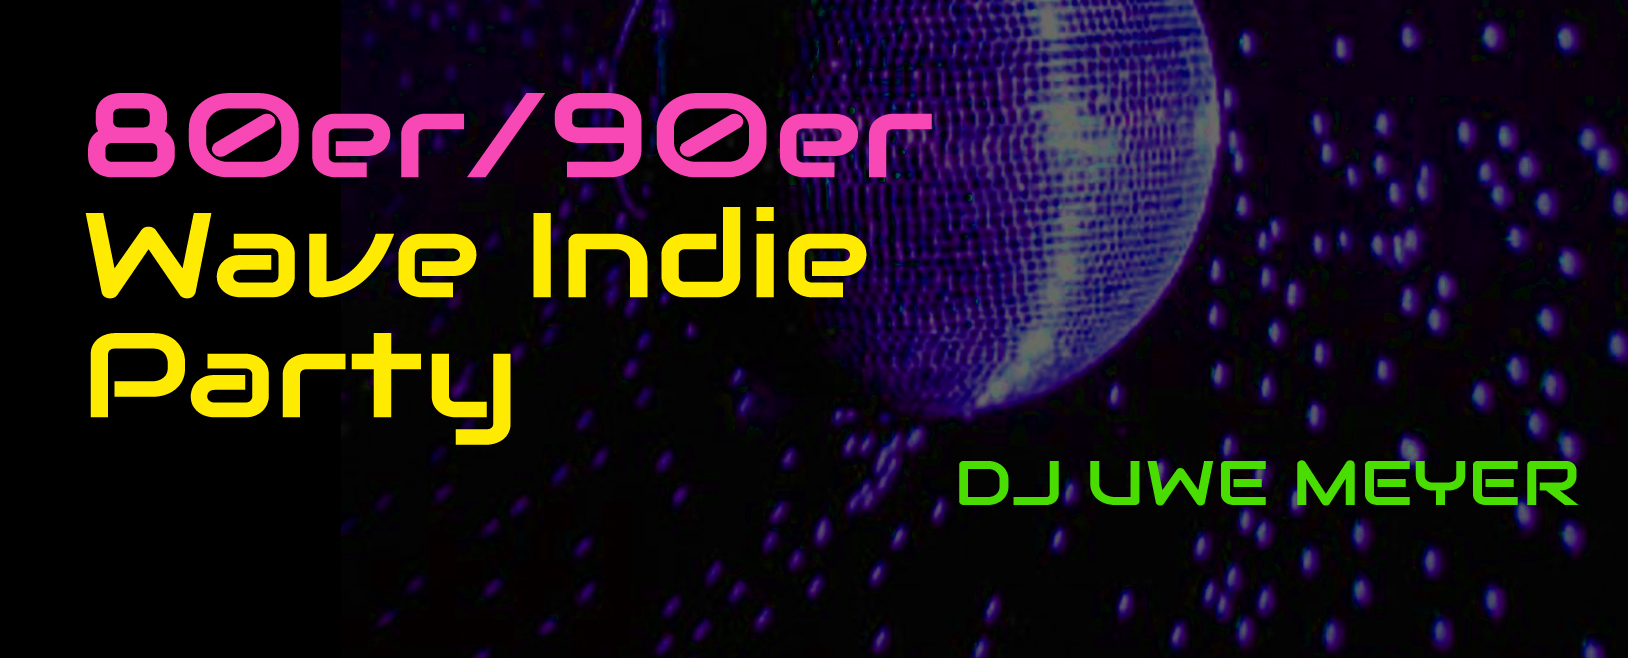 Musiktheater Piano - Wave Indie Party | Rundblick Dortmund